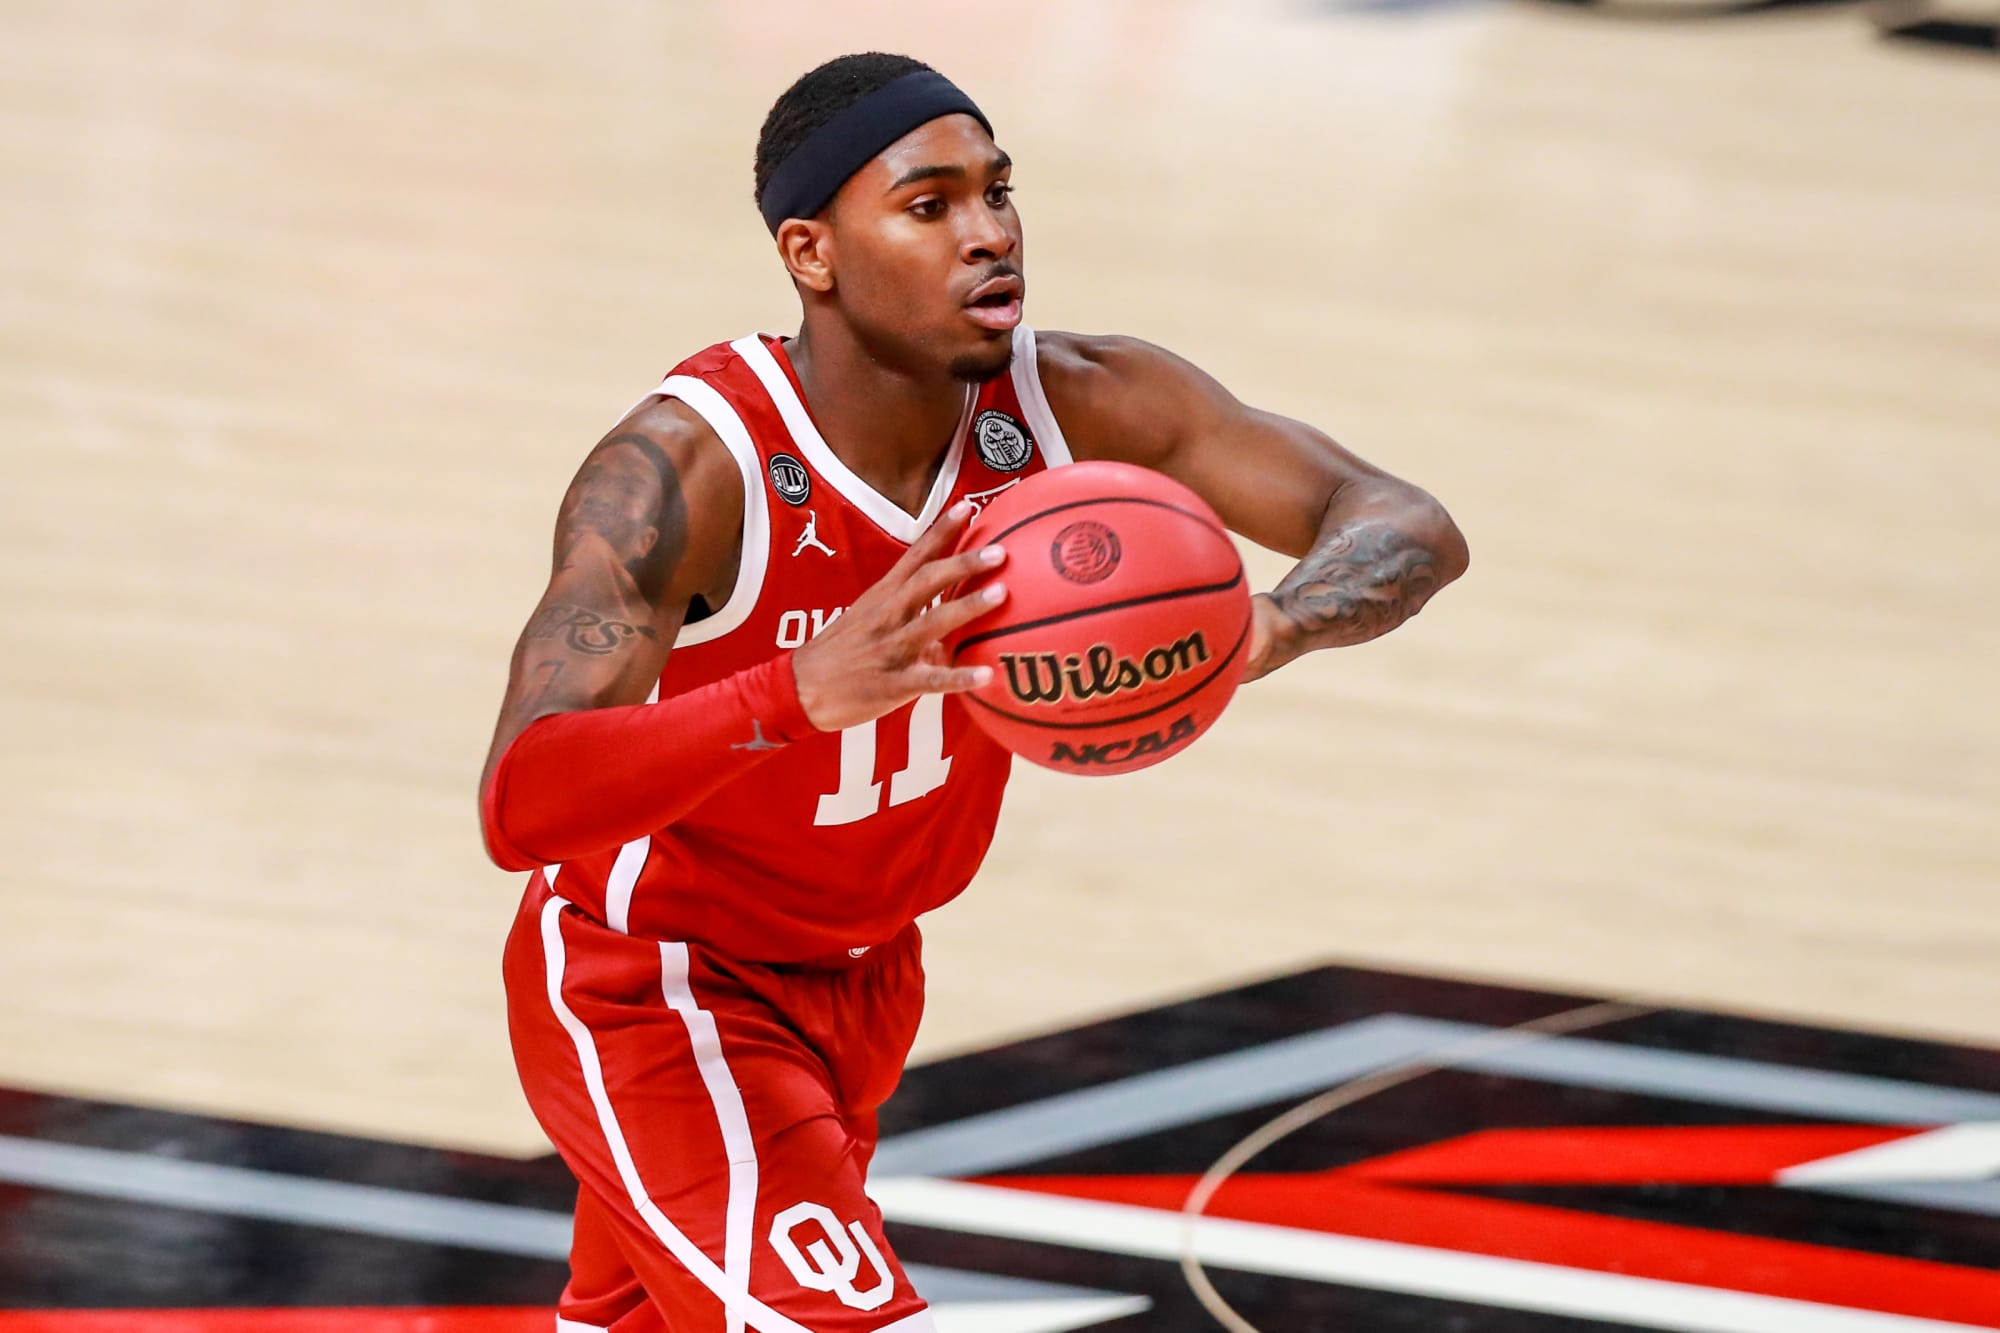 Texas Basketball: Predicting next transfer addition after Christian Bishop